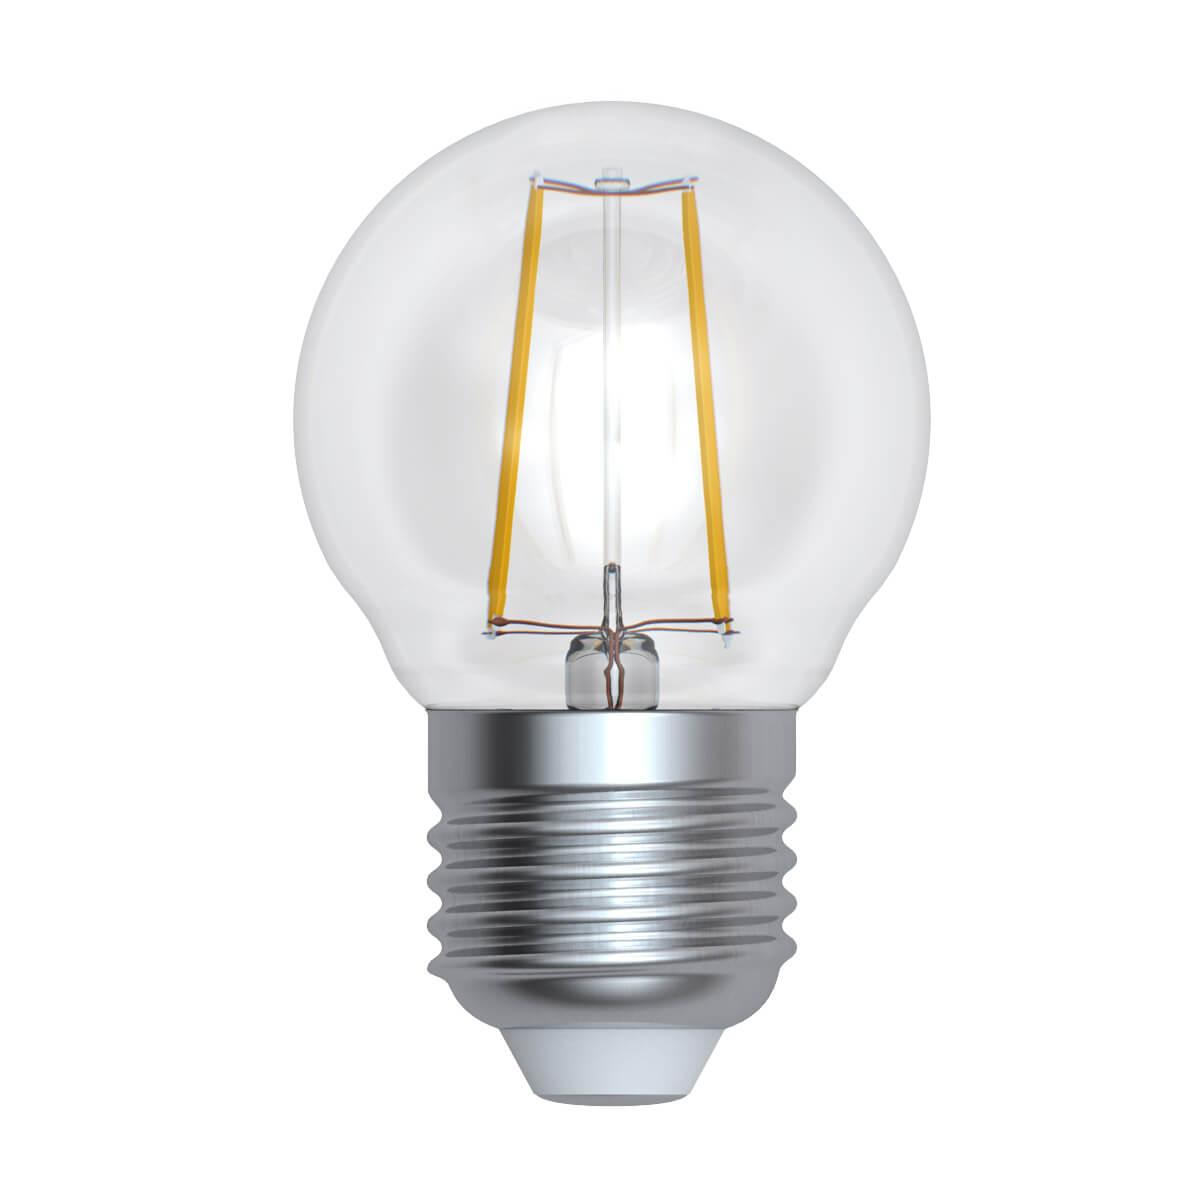 Лампочка Uniel LED-G45-9W/3000K/E27/CL PLS02WH LED-G45 лампочка uniel led g45 9w 3000k e27 cl pls02wh led g45